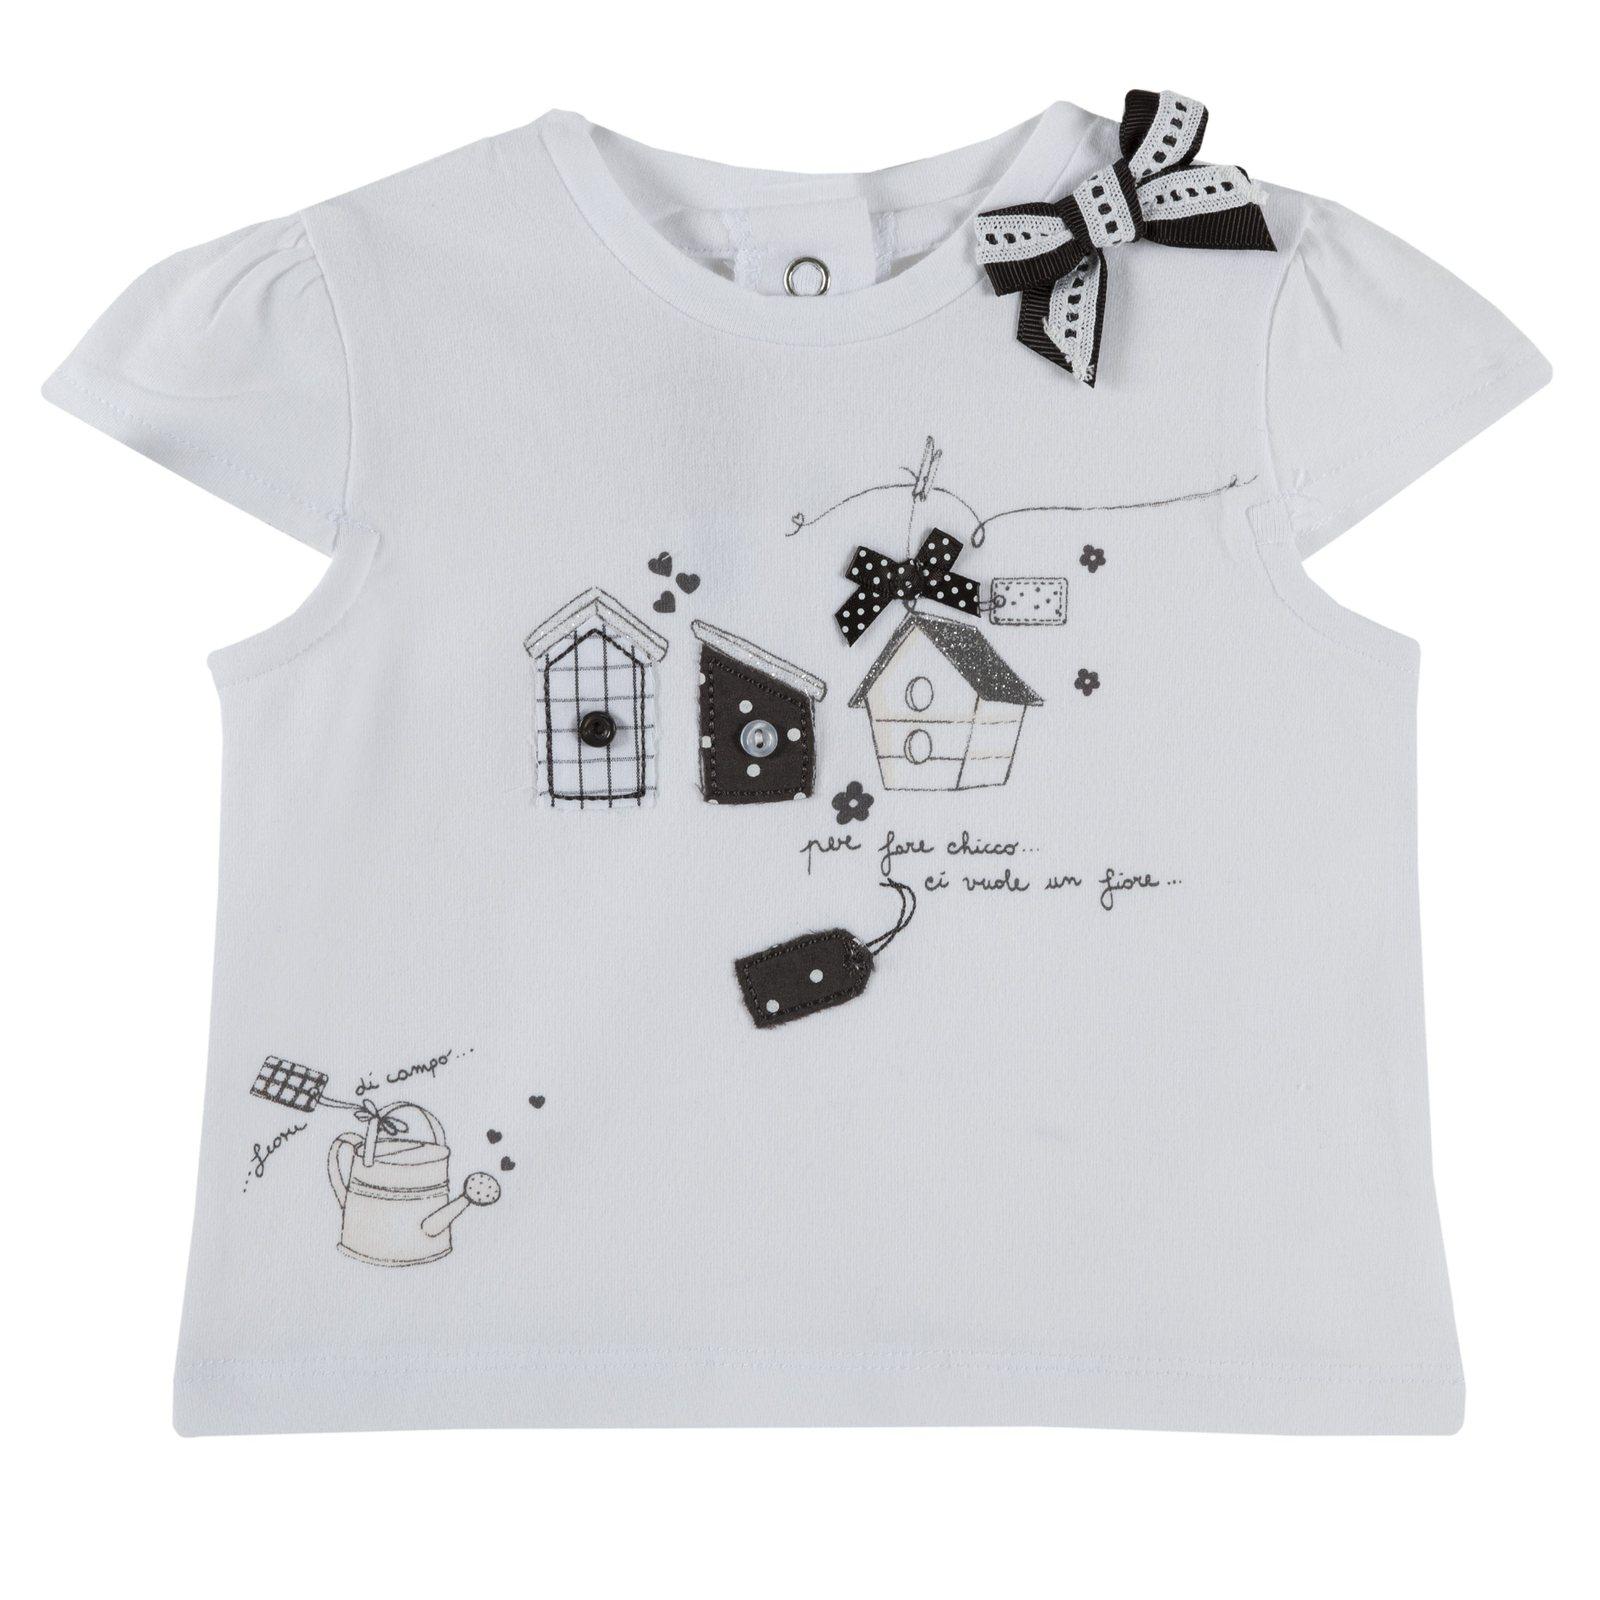 75de5ca257b6fb Camicie e T-shirt bambina t-shirt con stampe e fiocchetti bianco e ...